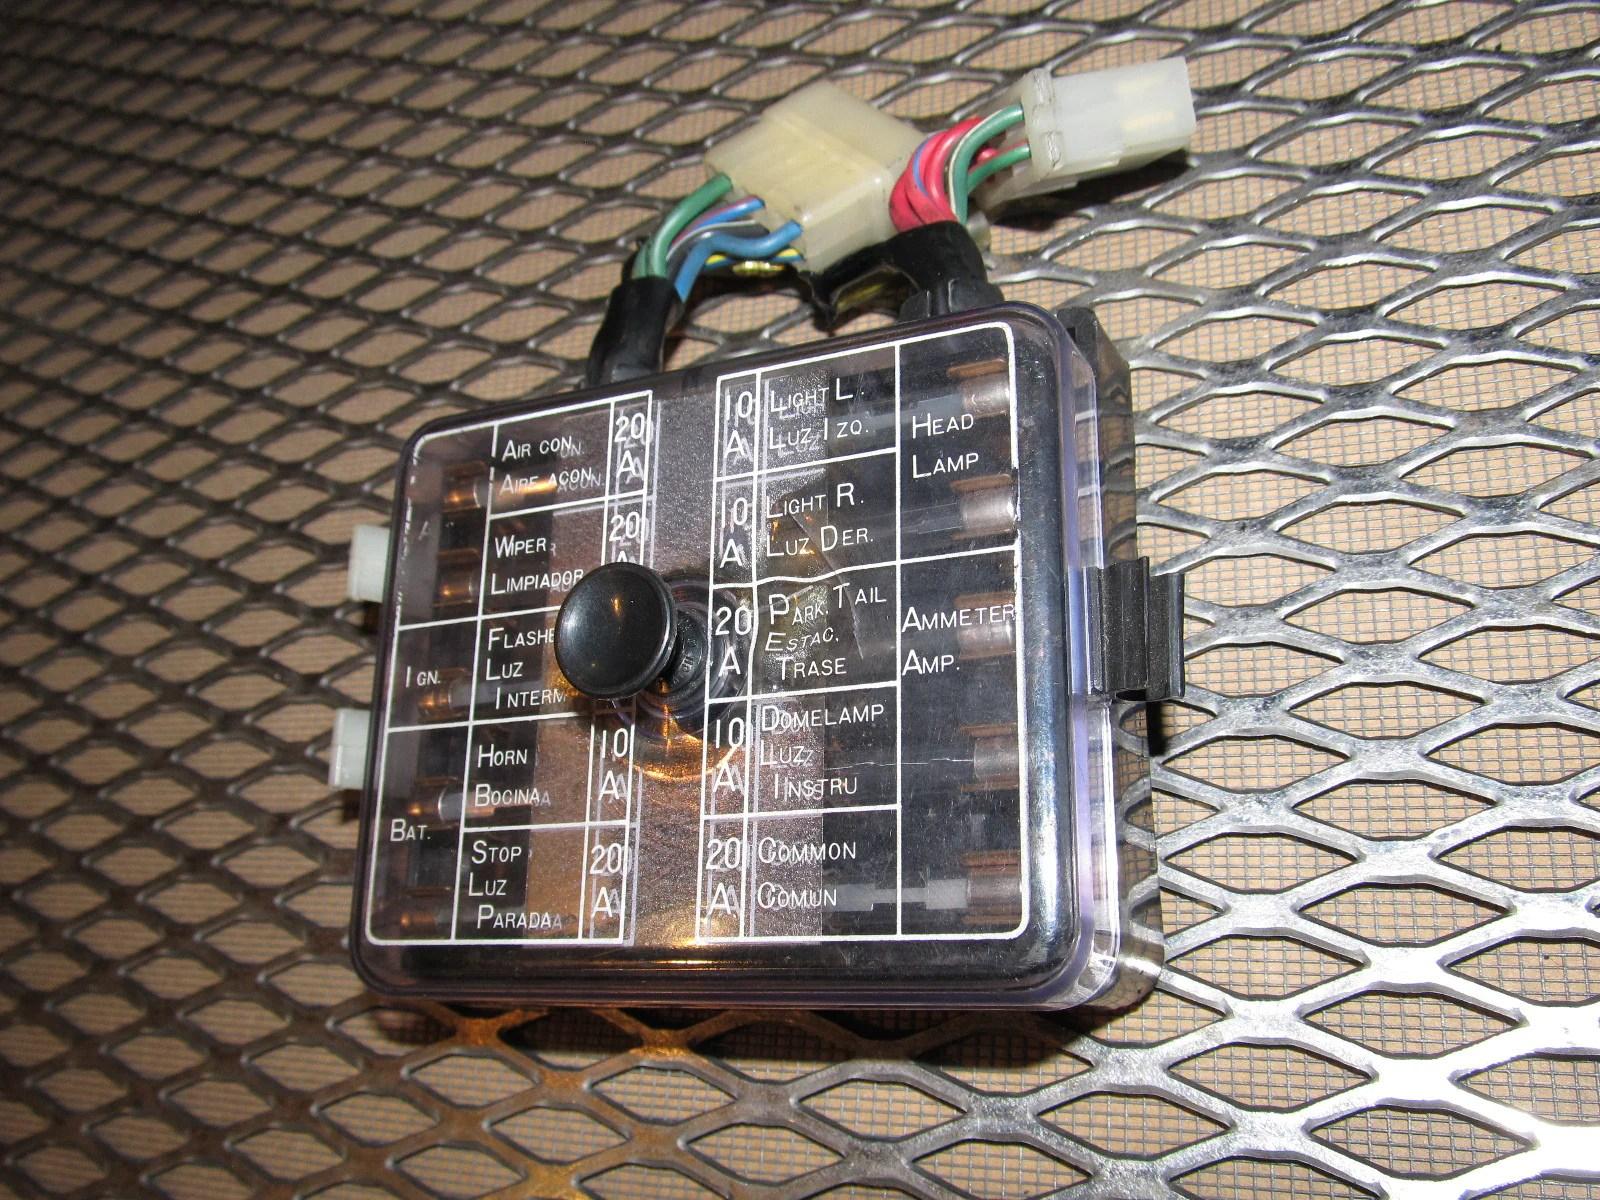 rx7 convertible fuse box 1988 mazda rx 7 convertible parts 1990 mazda rx7 fuse box diagram [ 1600 x 1200 Pixel ]